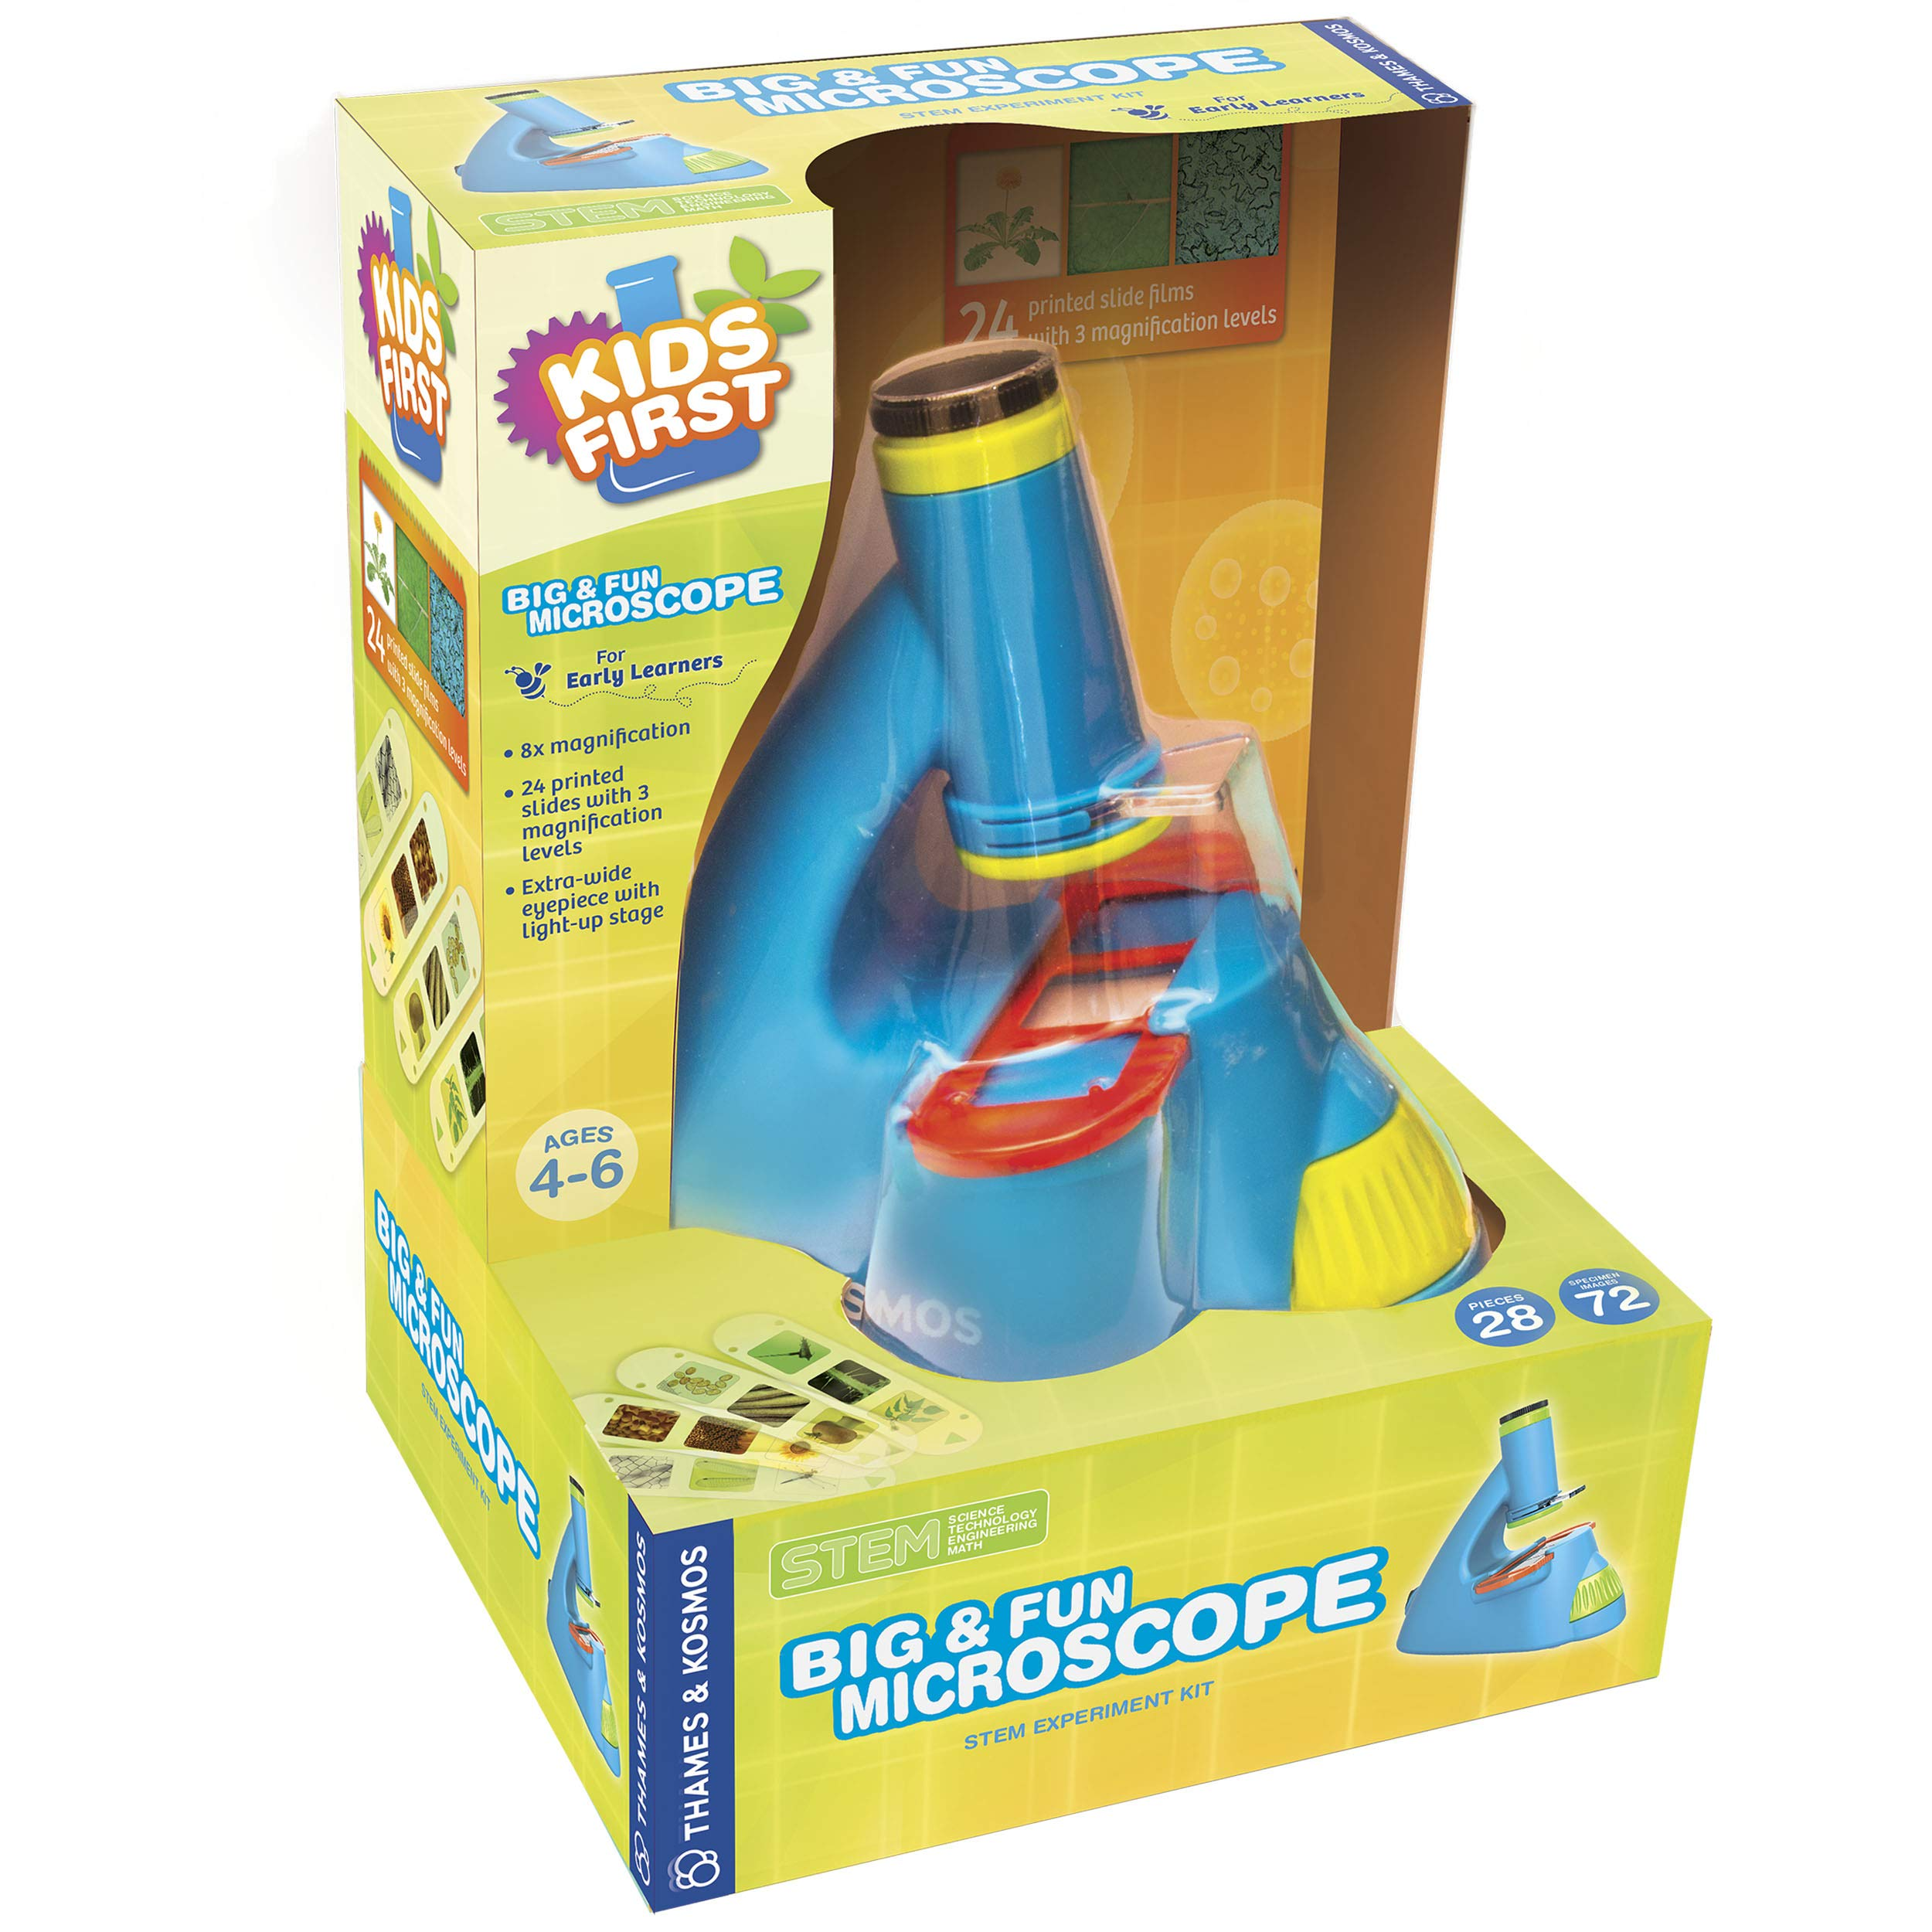 Thames & Kosmos 634032 Kids First Big & Fun Microscope Science Experiment Kit by Thames & Kosmos